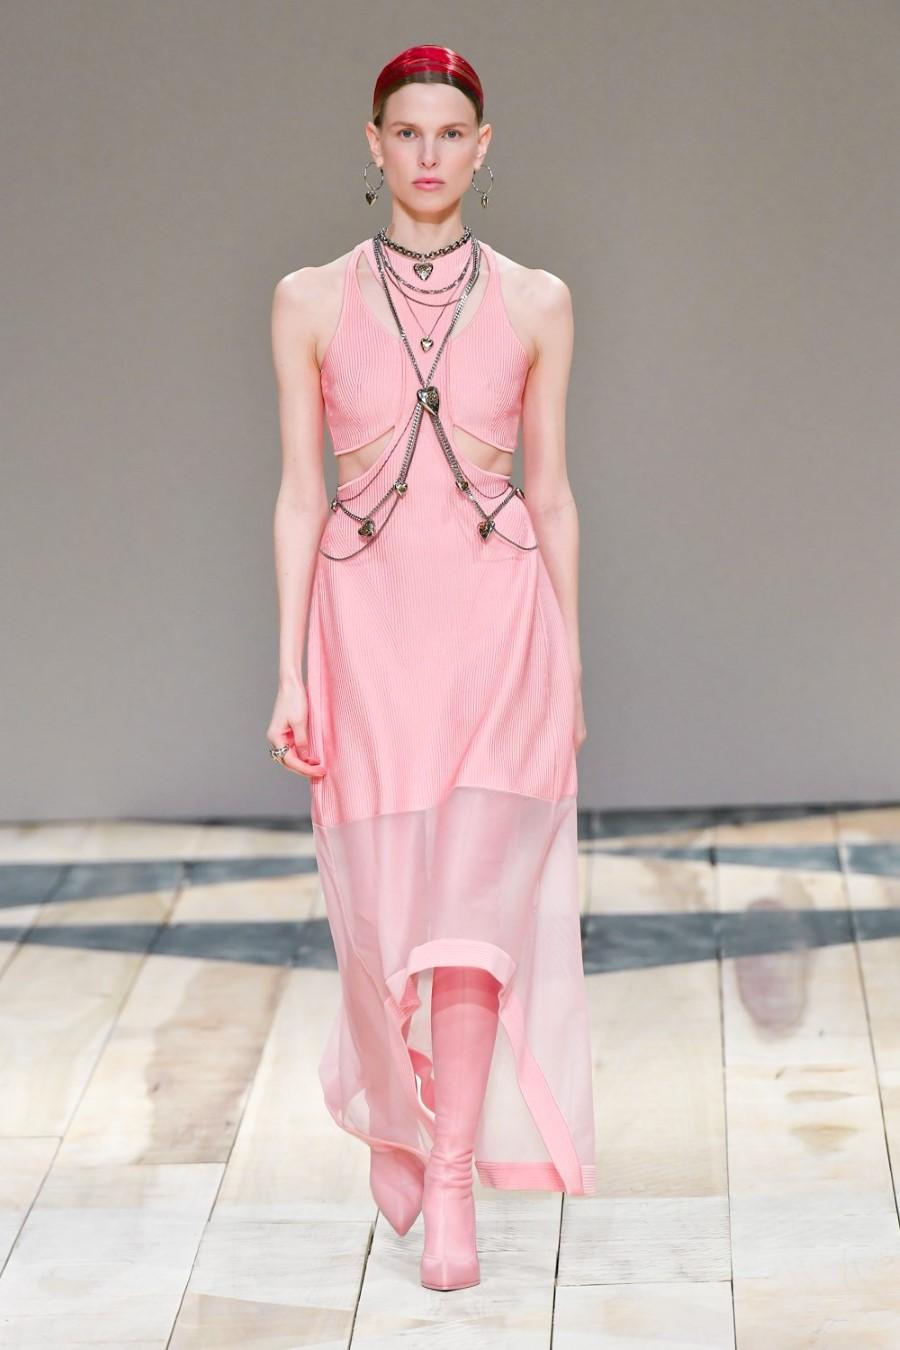 Alexander McQueen - Fall Winter 2020 - Paris Fashion Week